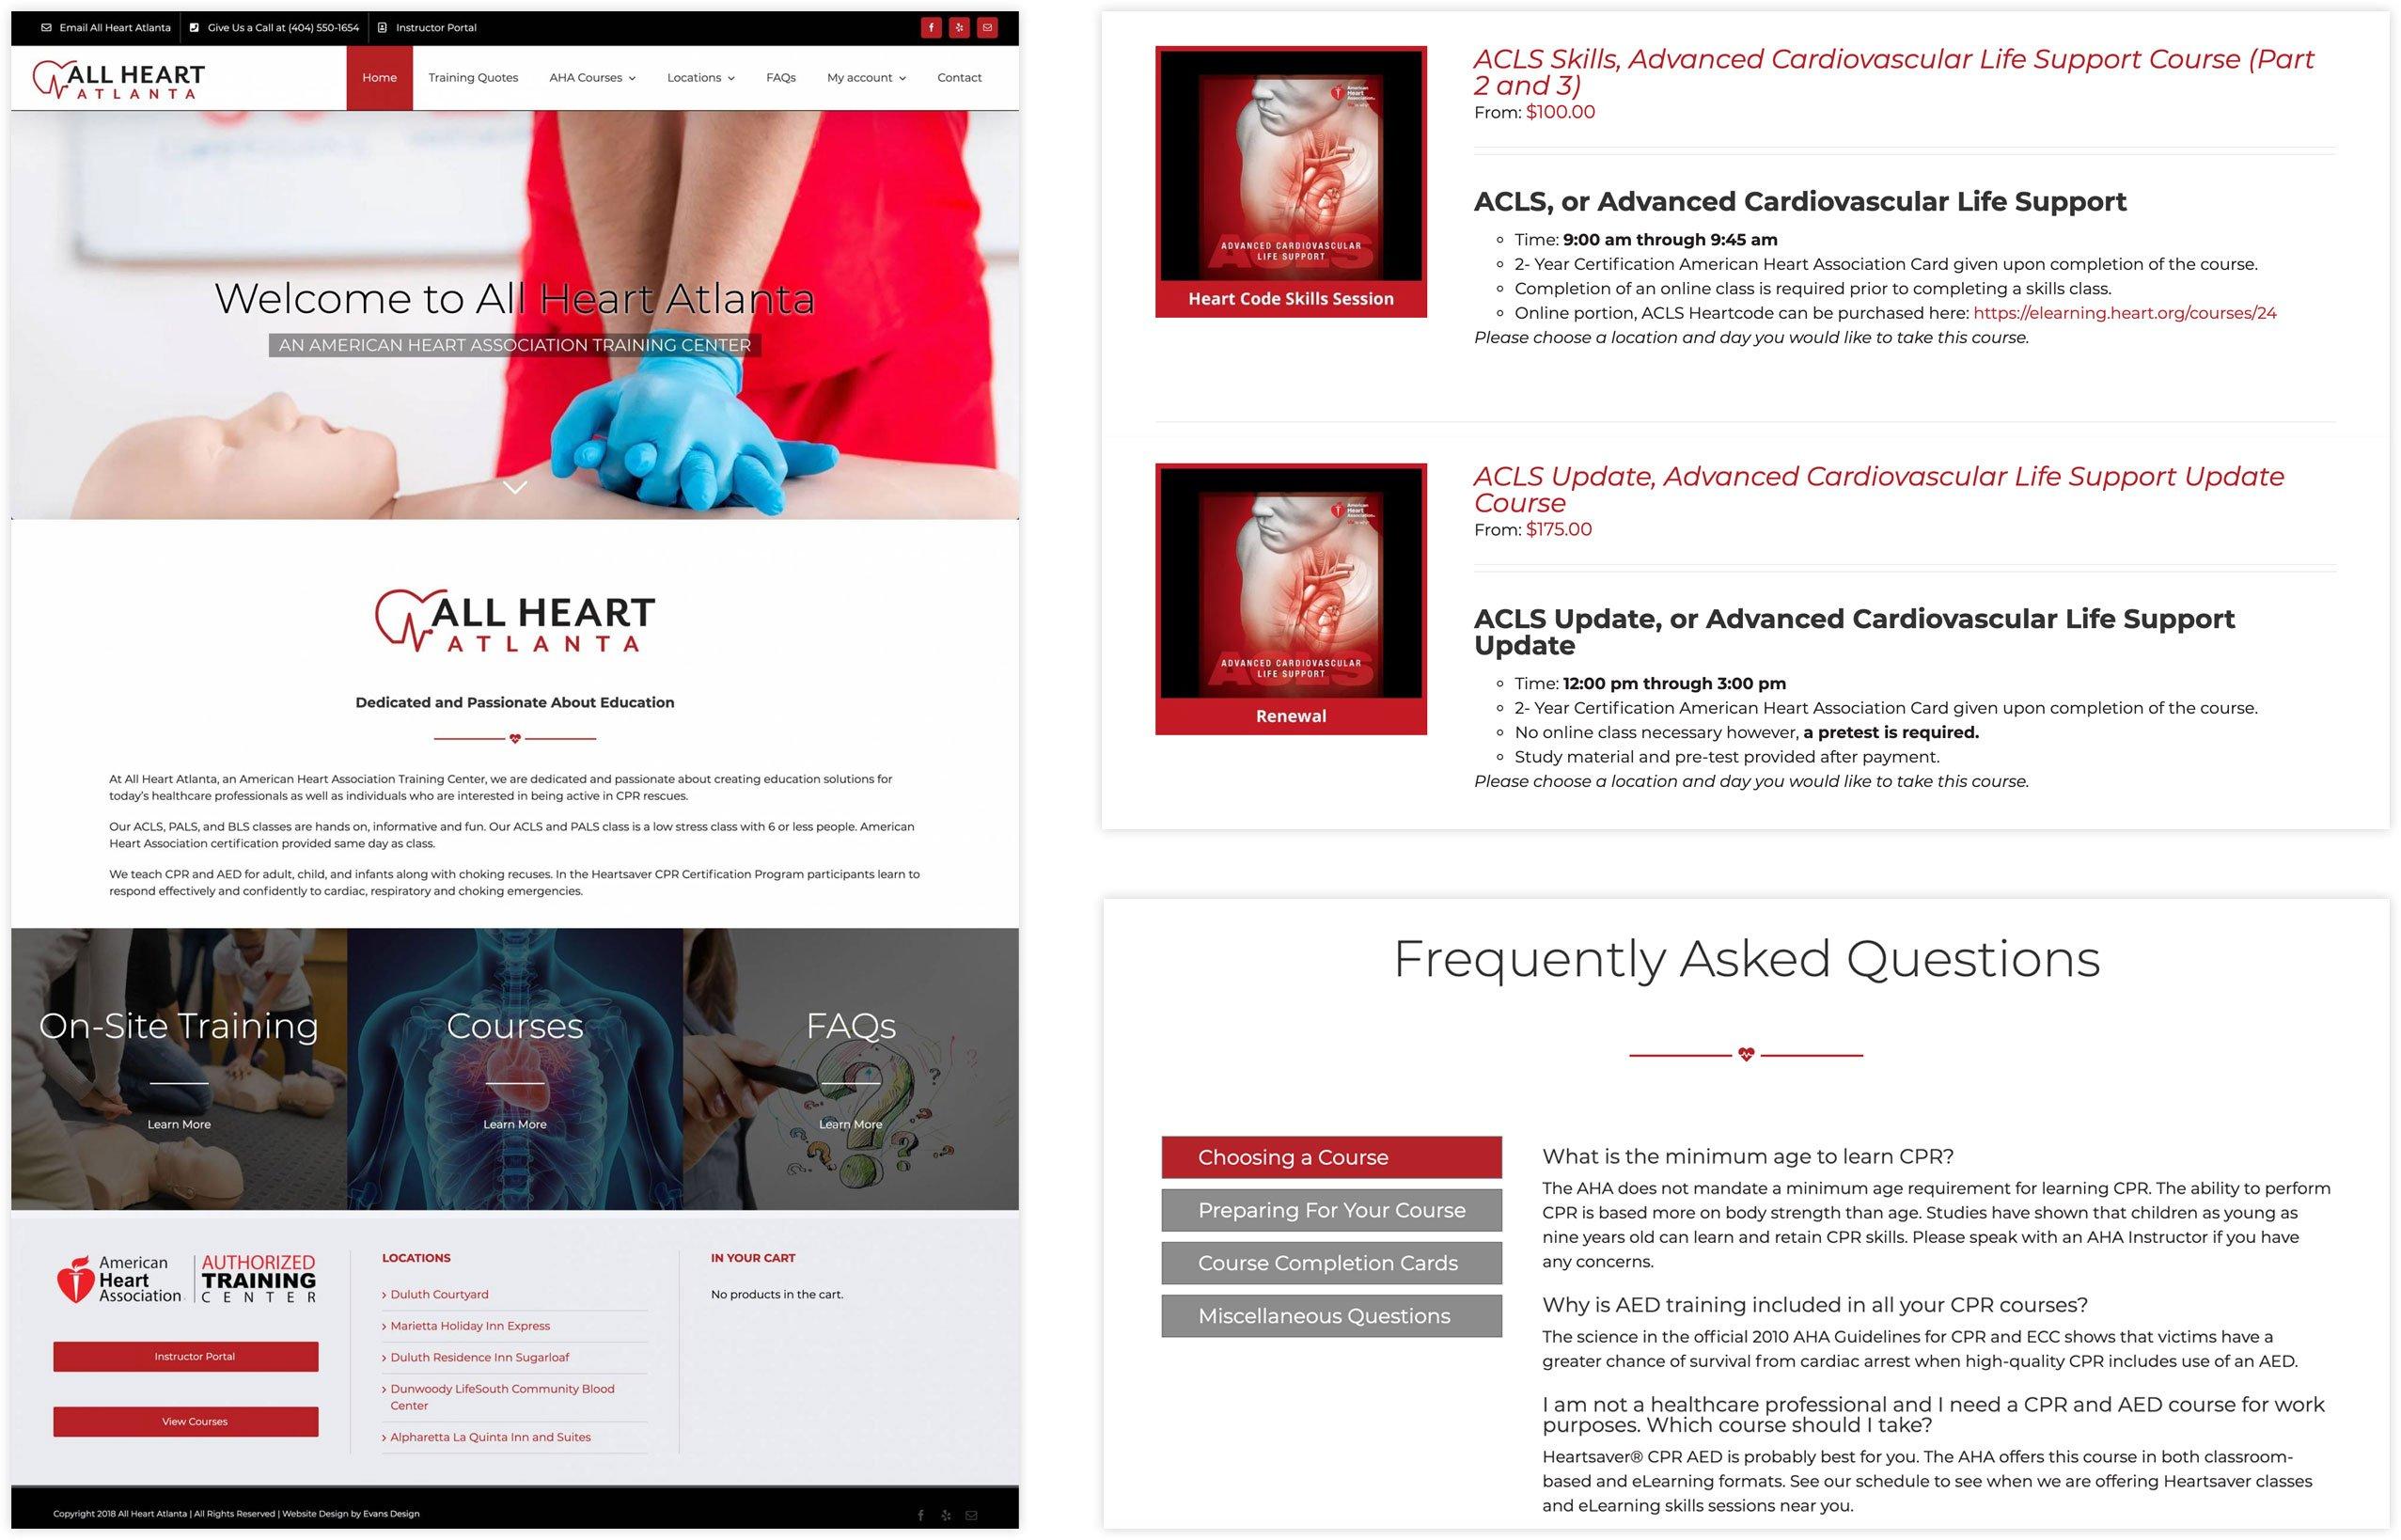 All Heart Atlanta Healthcare Website Design